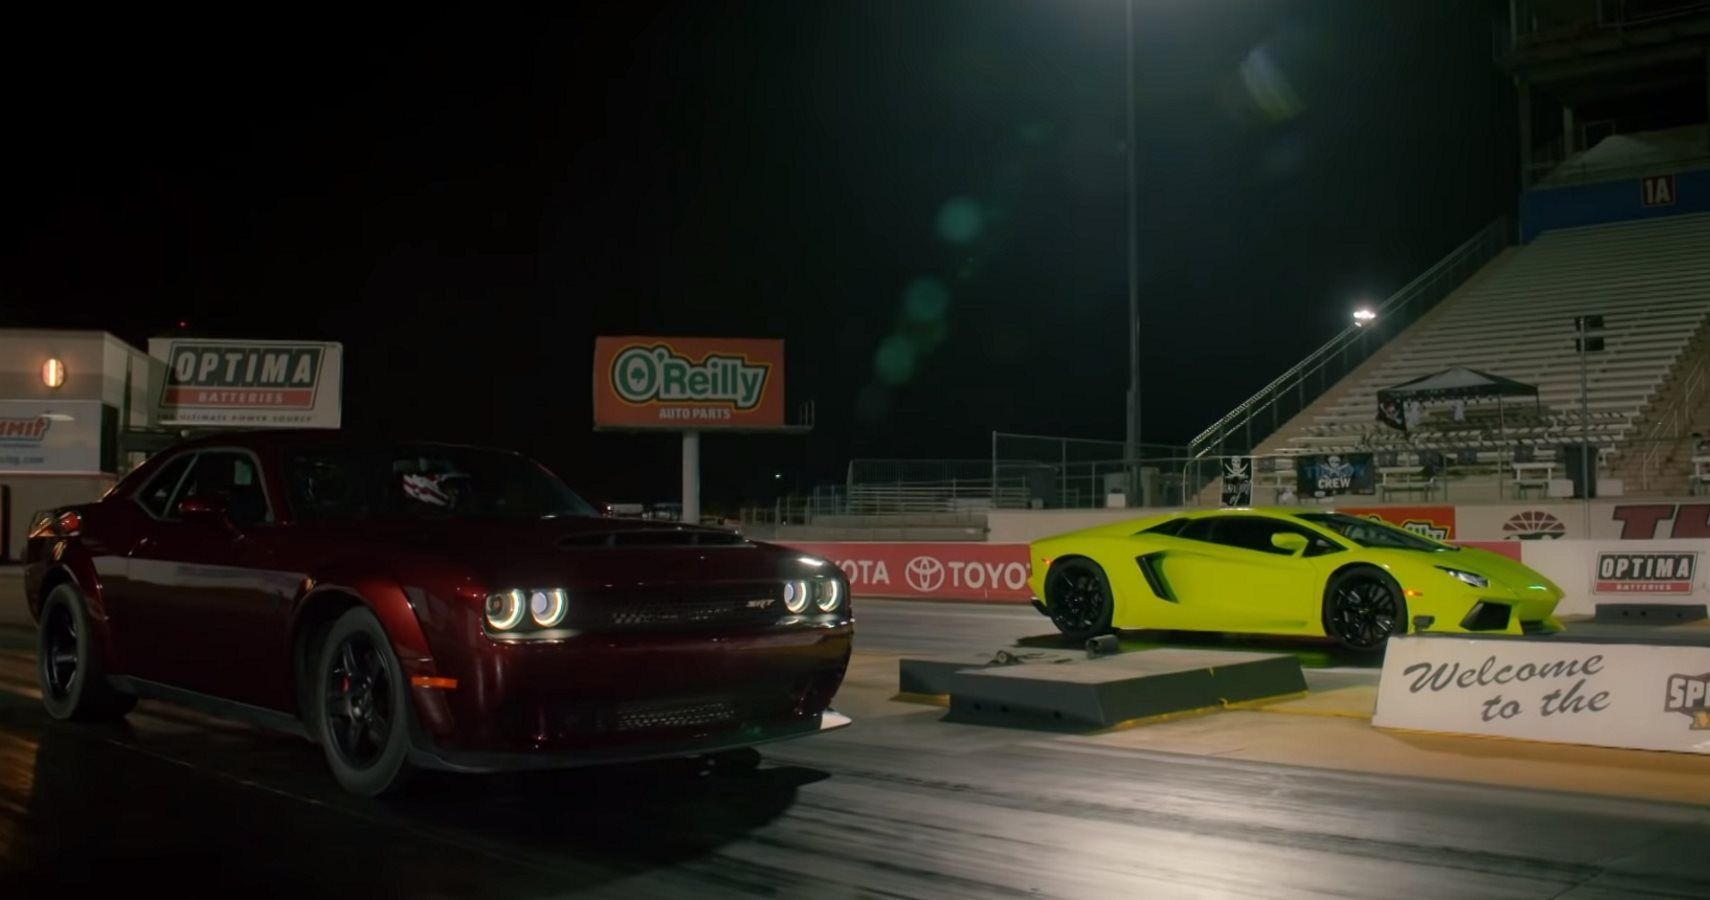 Watch A Dodge Demon Crush A Lamborghini Aventador At The Drag Strip